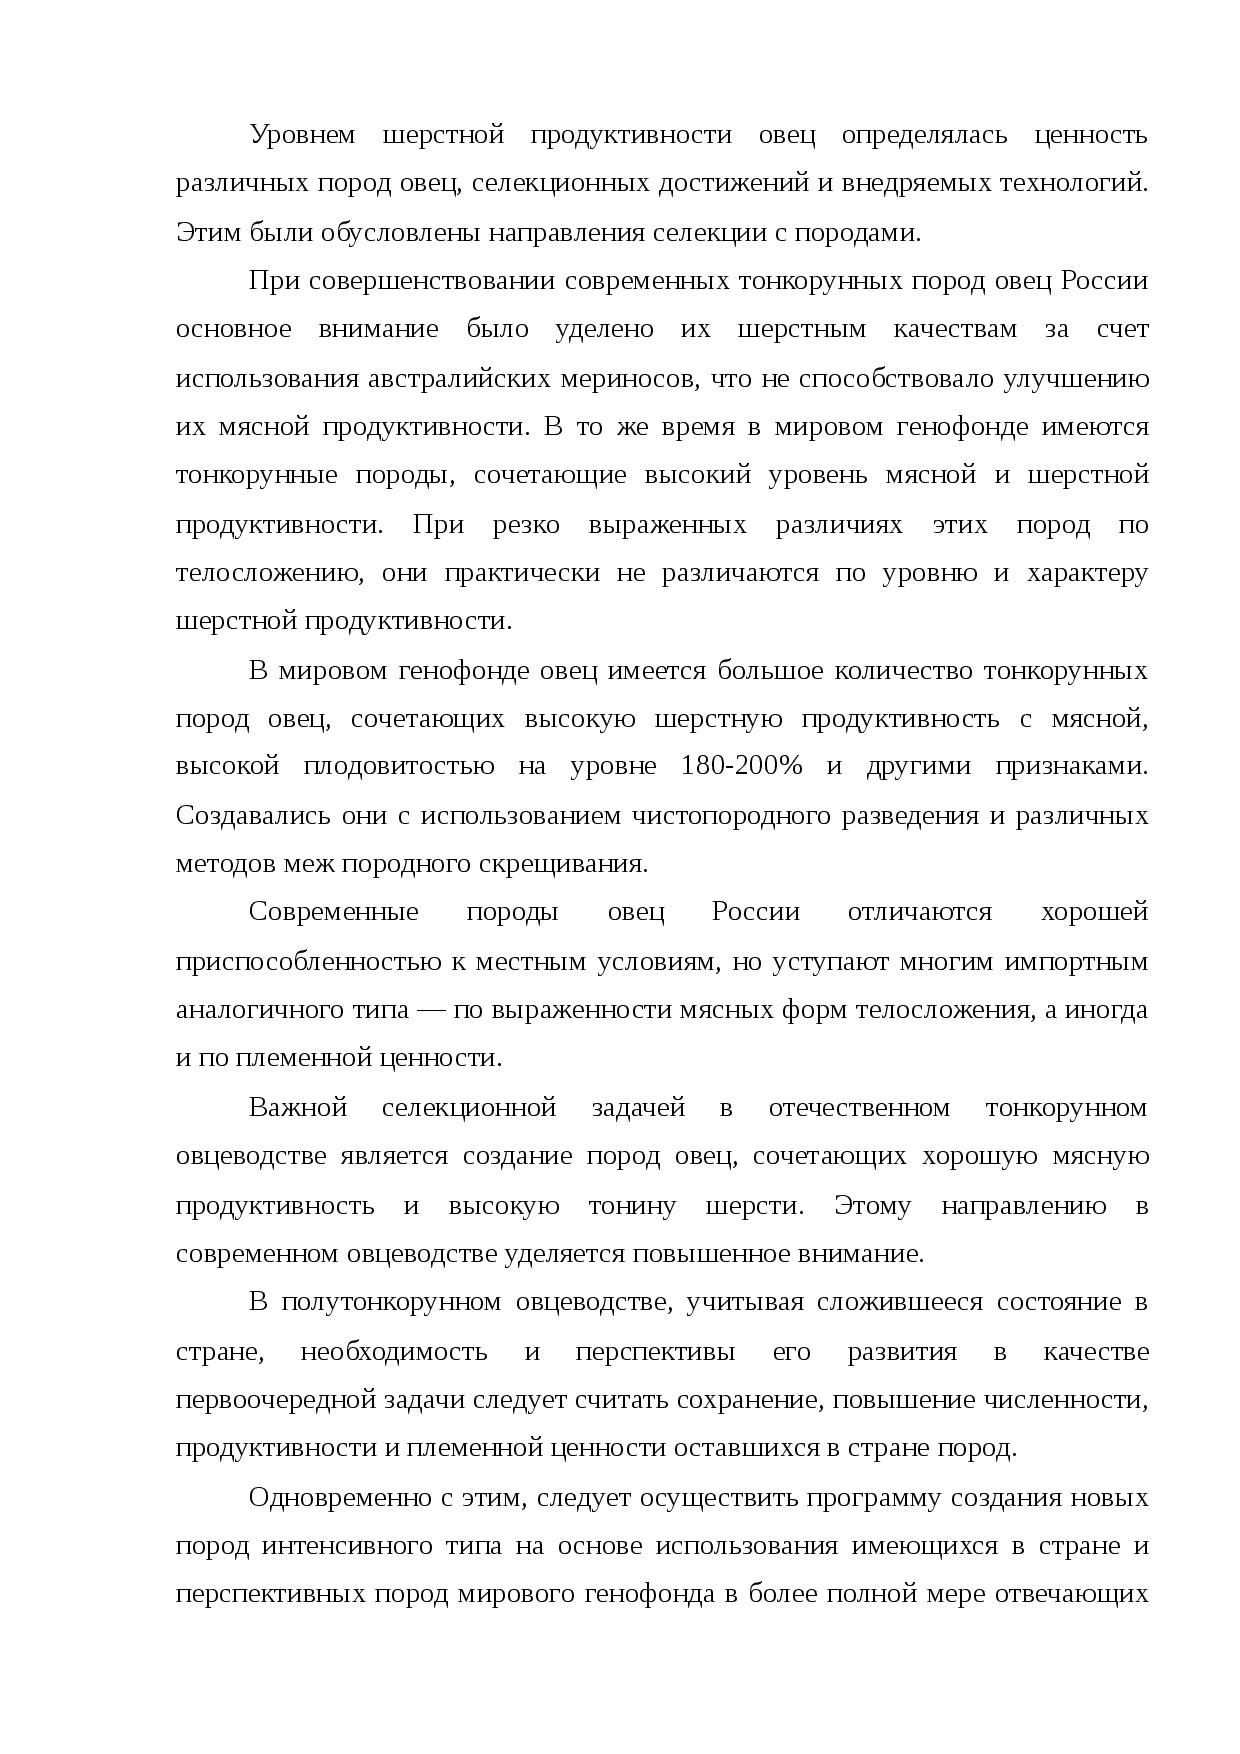 Инструкция по применению препарата бусидо от колорадского жука